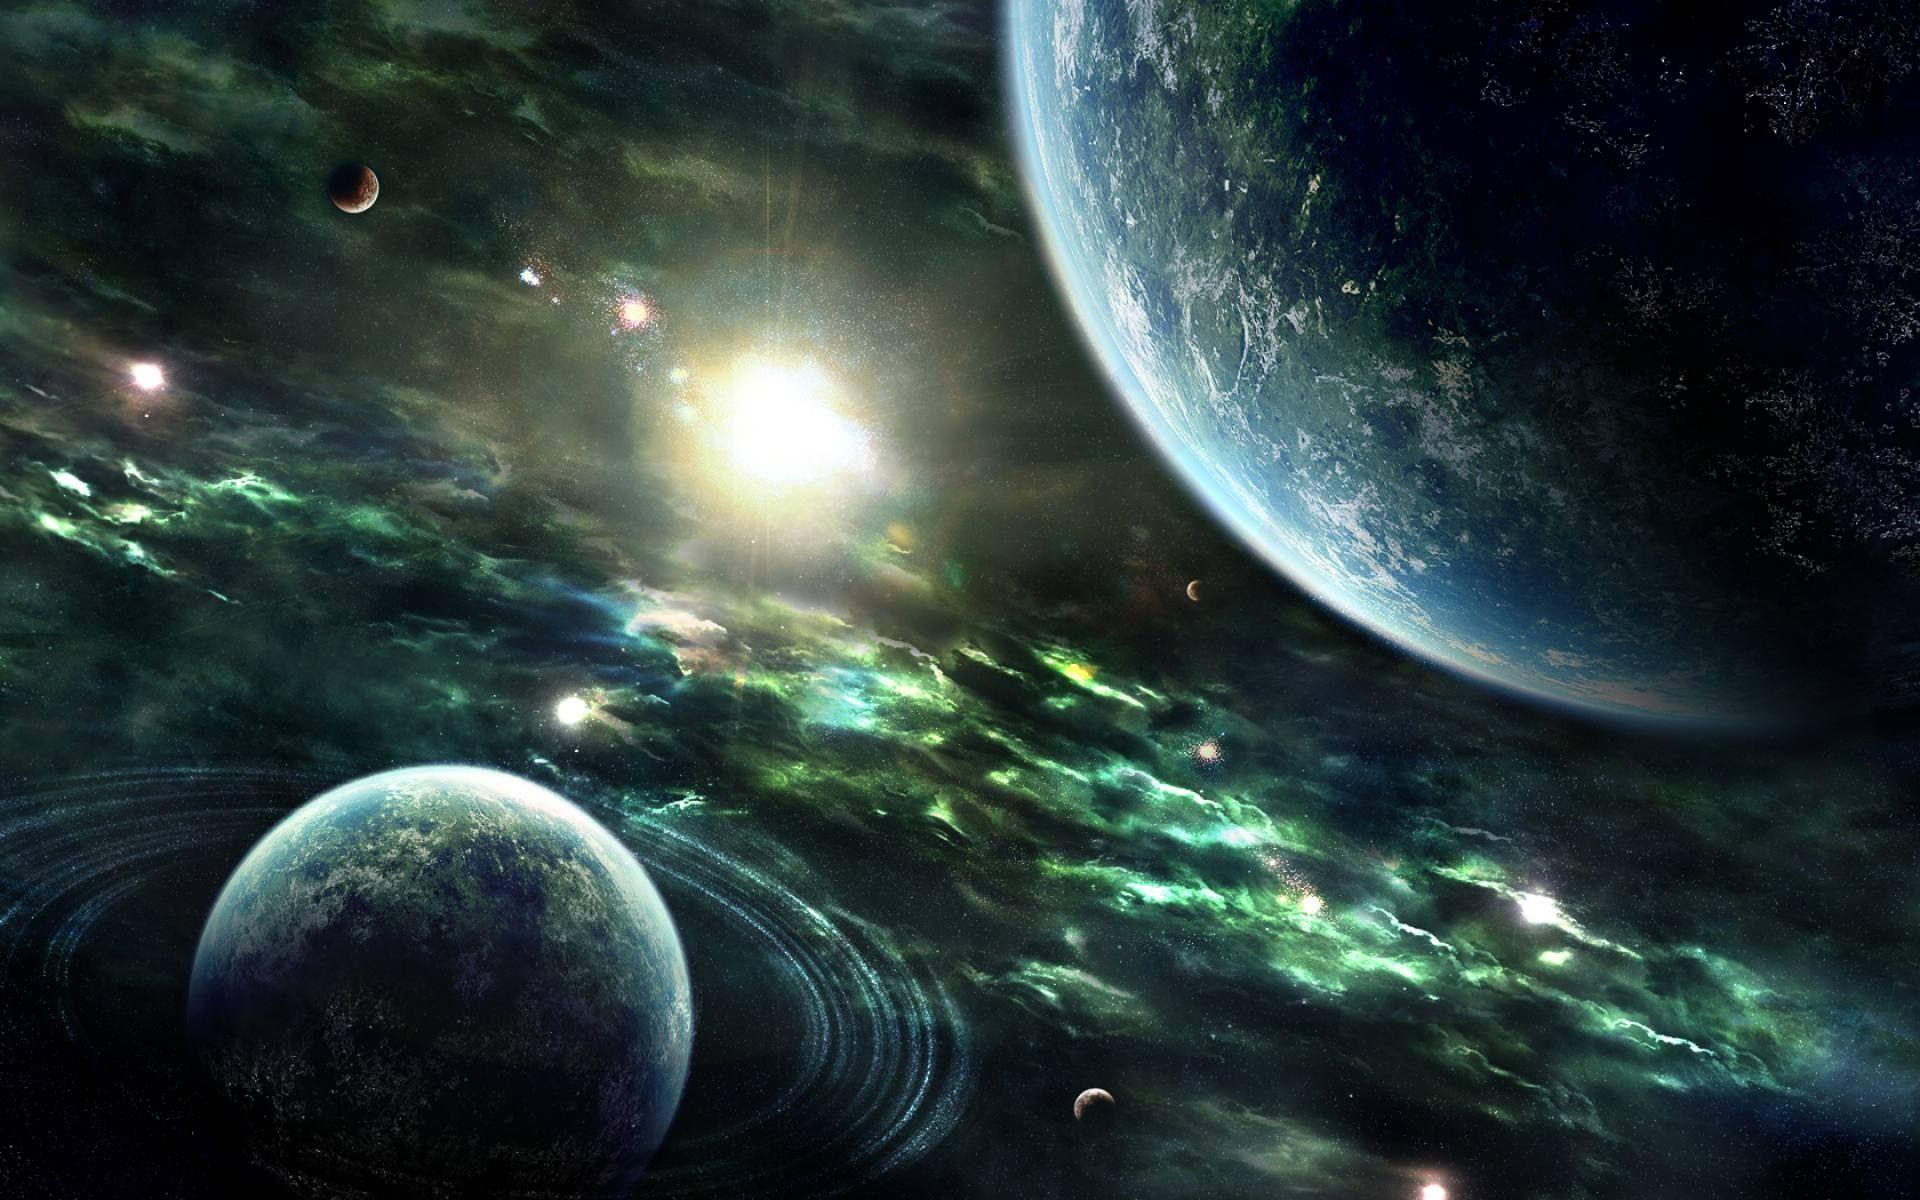 http://all-images.net/fond-ecran-hd-science-fiction-wallpaper-72/